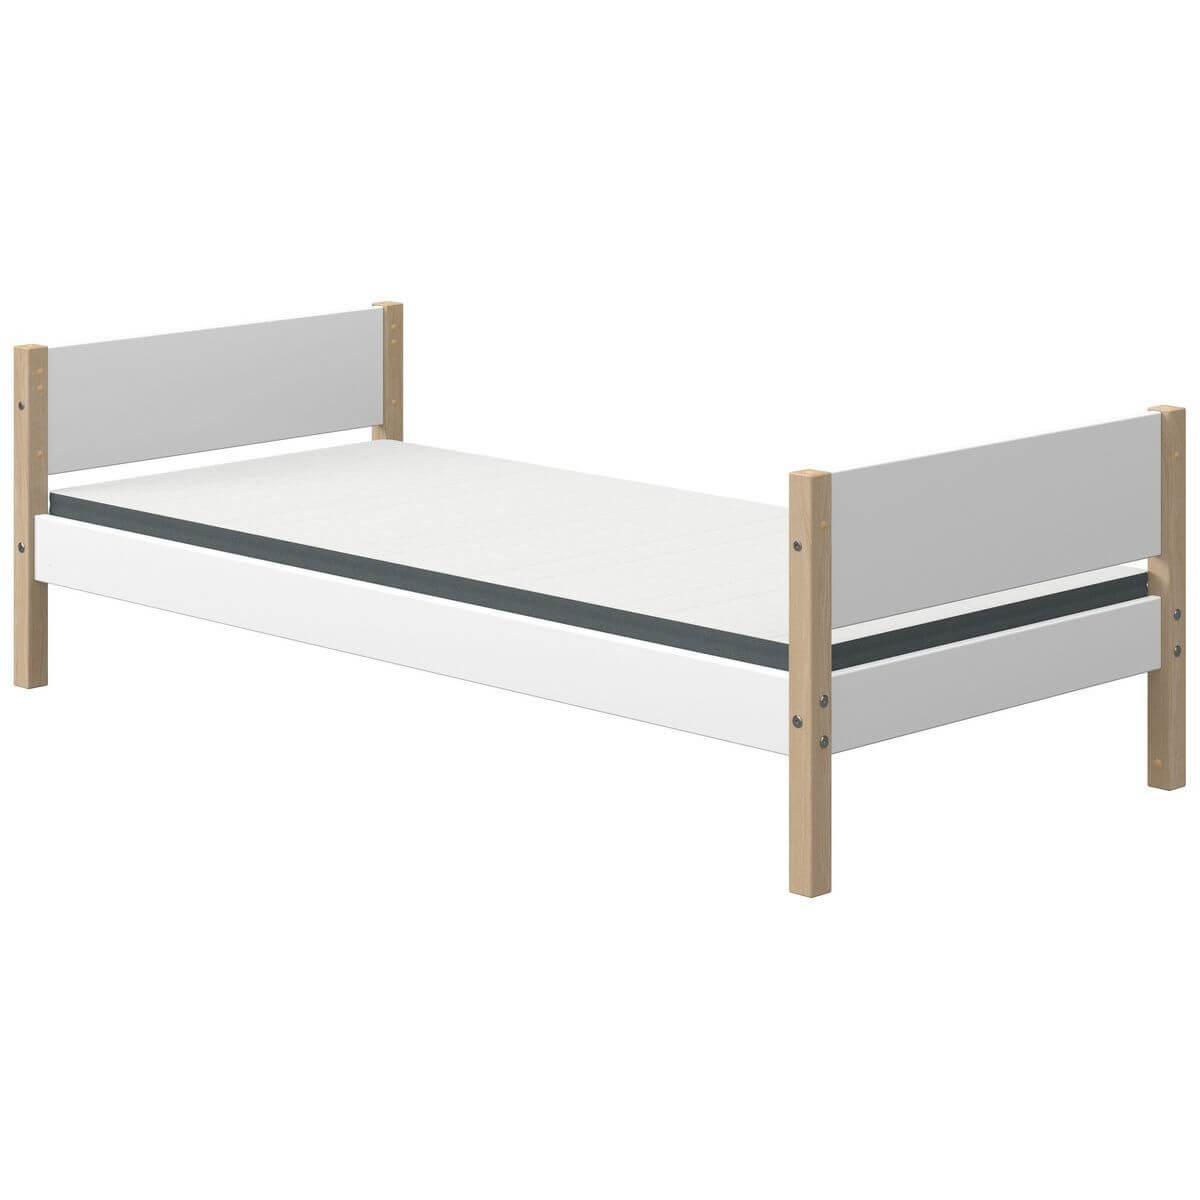 Cama individual 90x190cm NOR Flexa roble-blanco